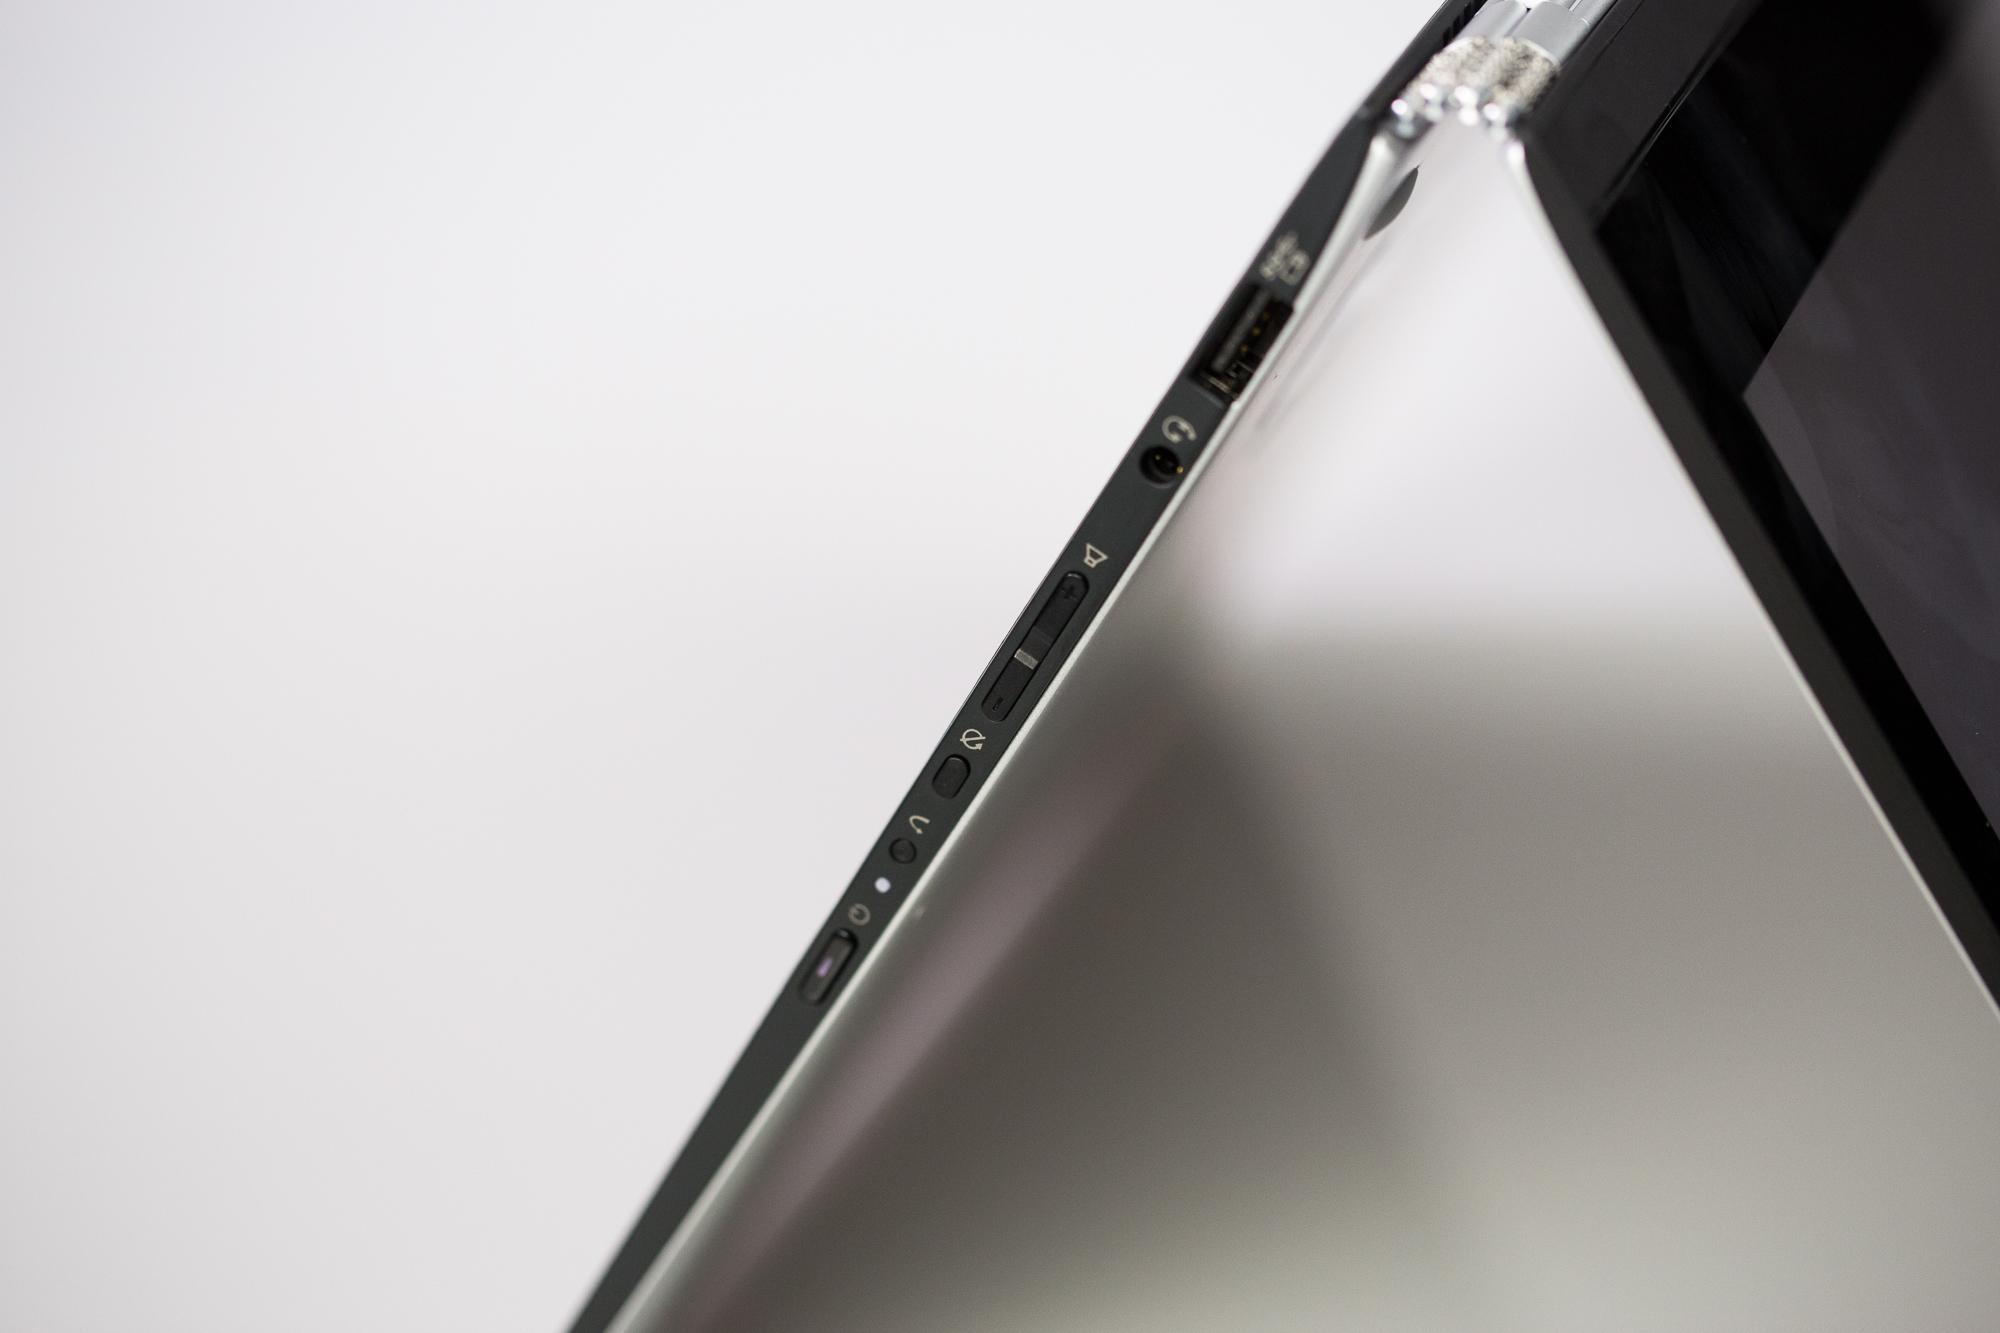 Yoga 3 Pro Convertible im Test: Flach, leicht, hochauflösend, kurzatmig - Yoga 3 Pro (Bild: Fabian Hamacher/Golem.de)